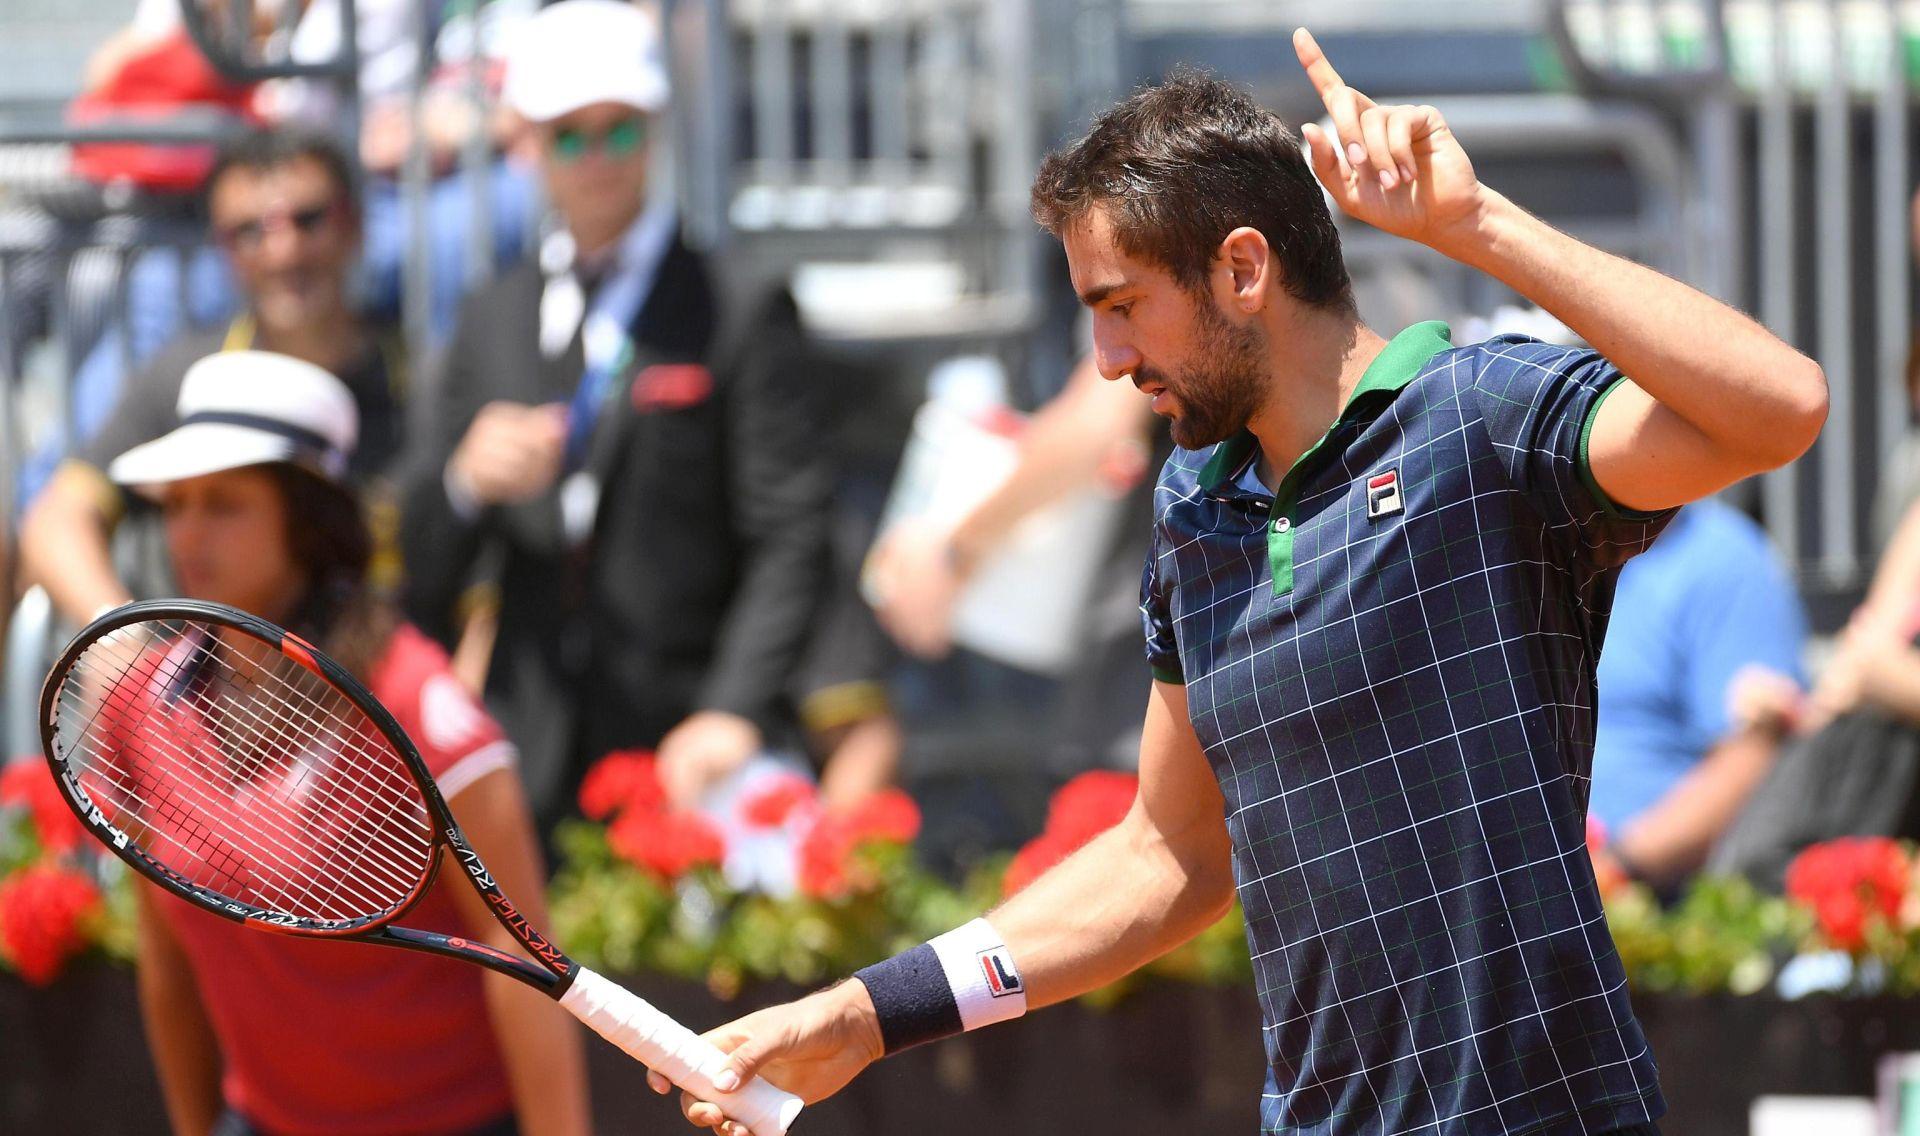 ATP LISTA Čilić ostao osmi, A. Zverev u Top 10